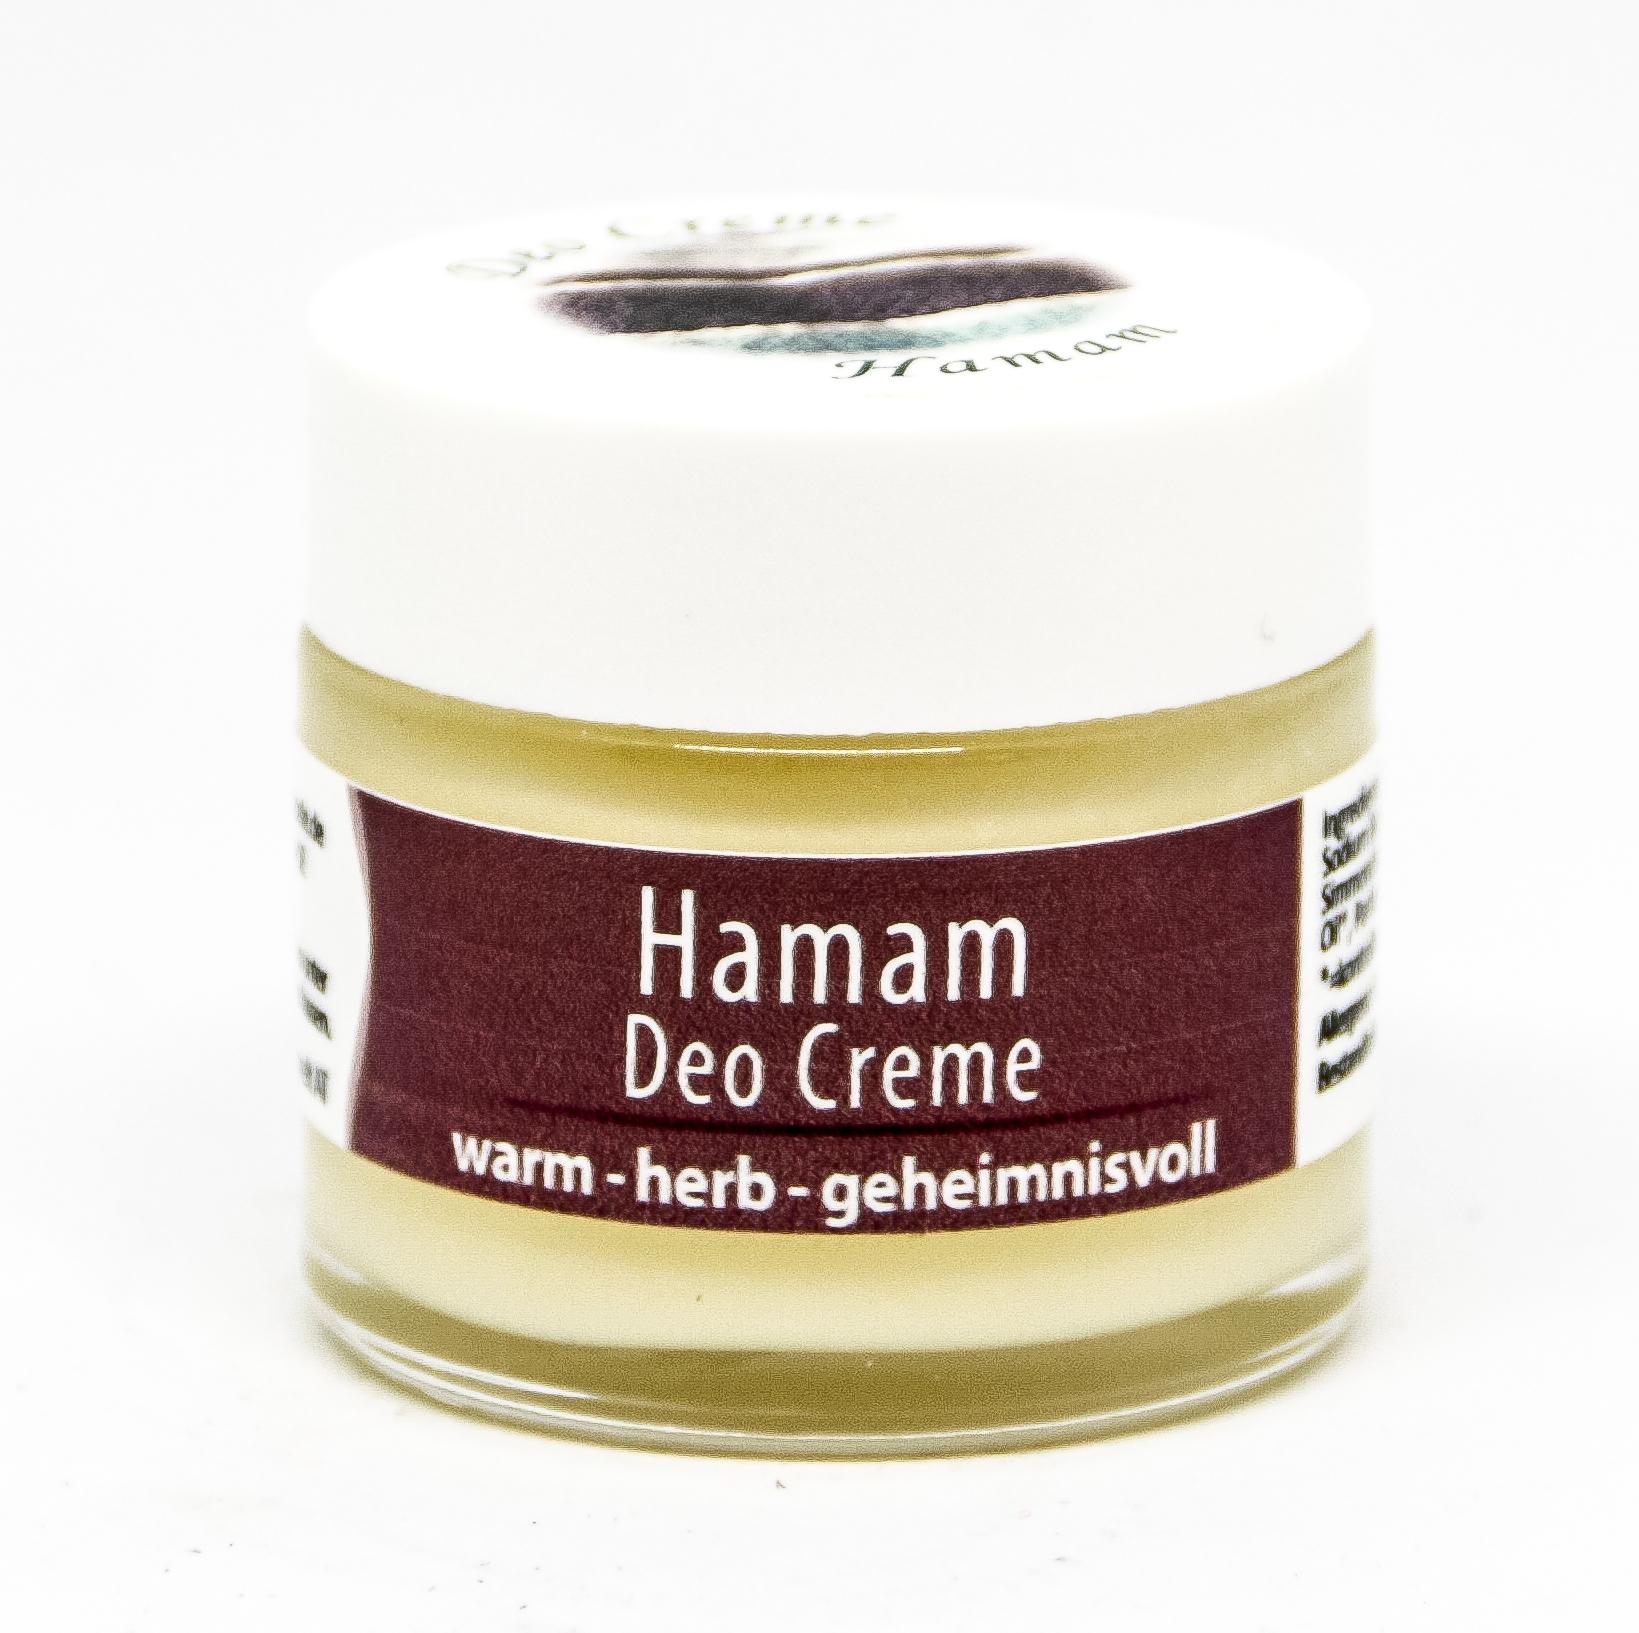 Deo Creme Hamam 30 Gramm